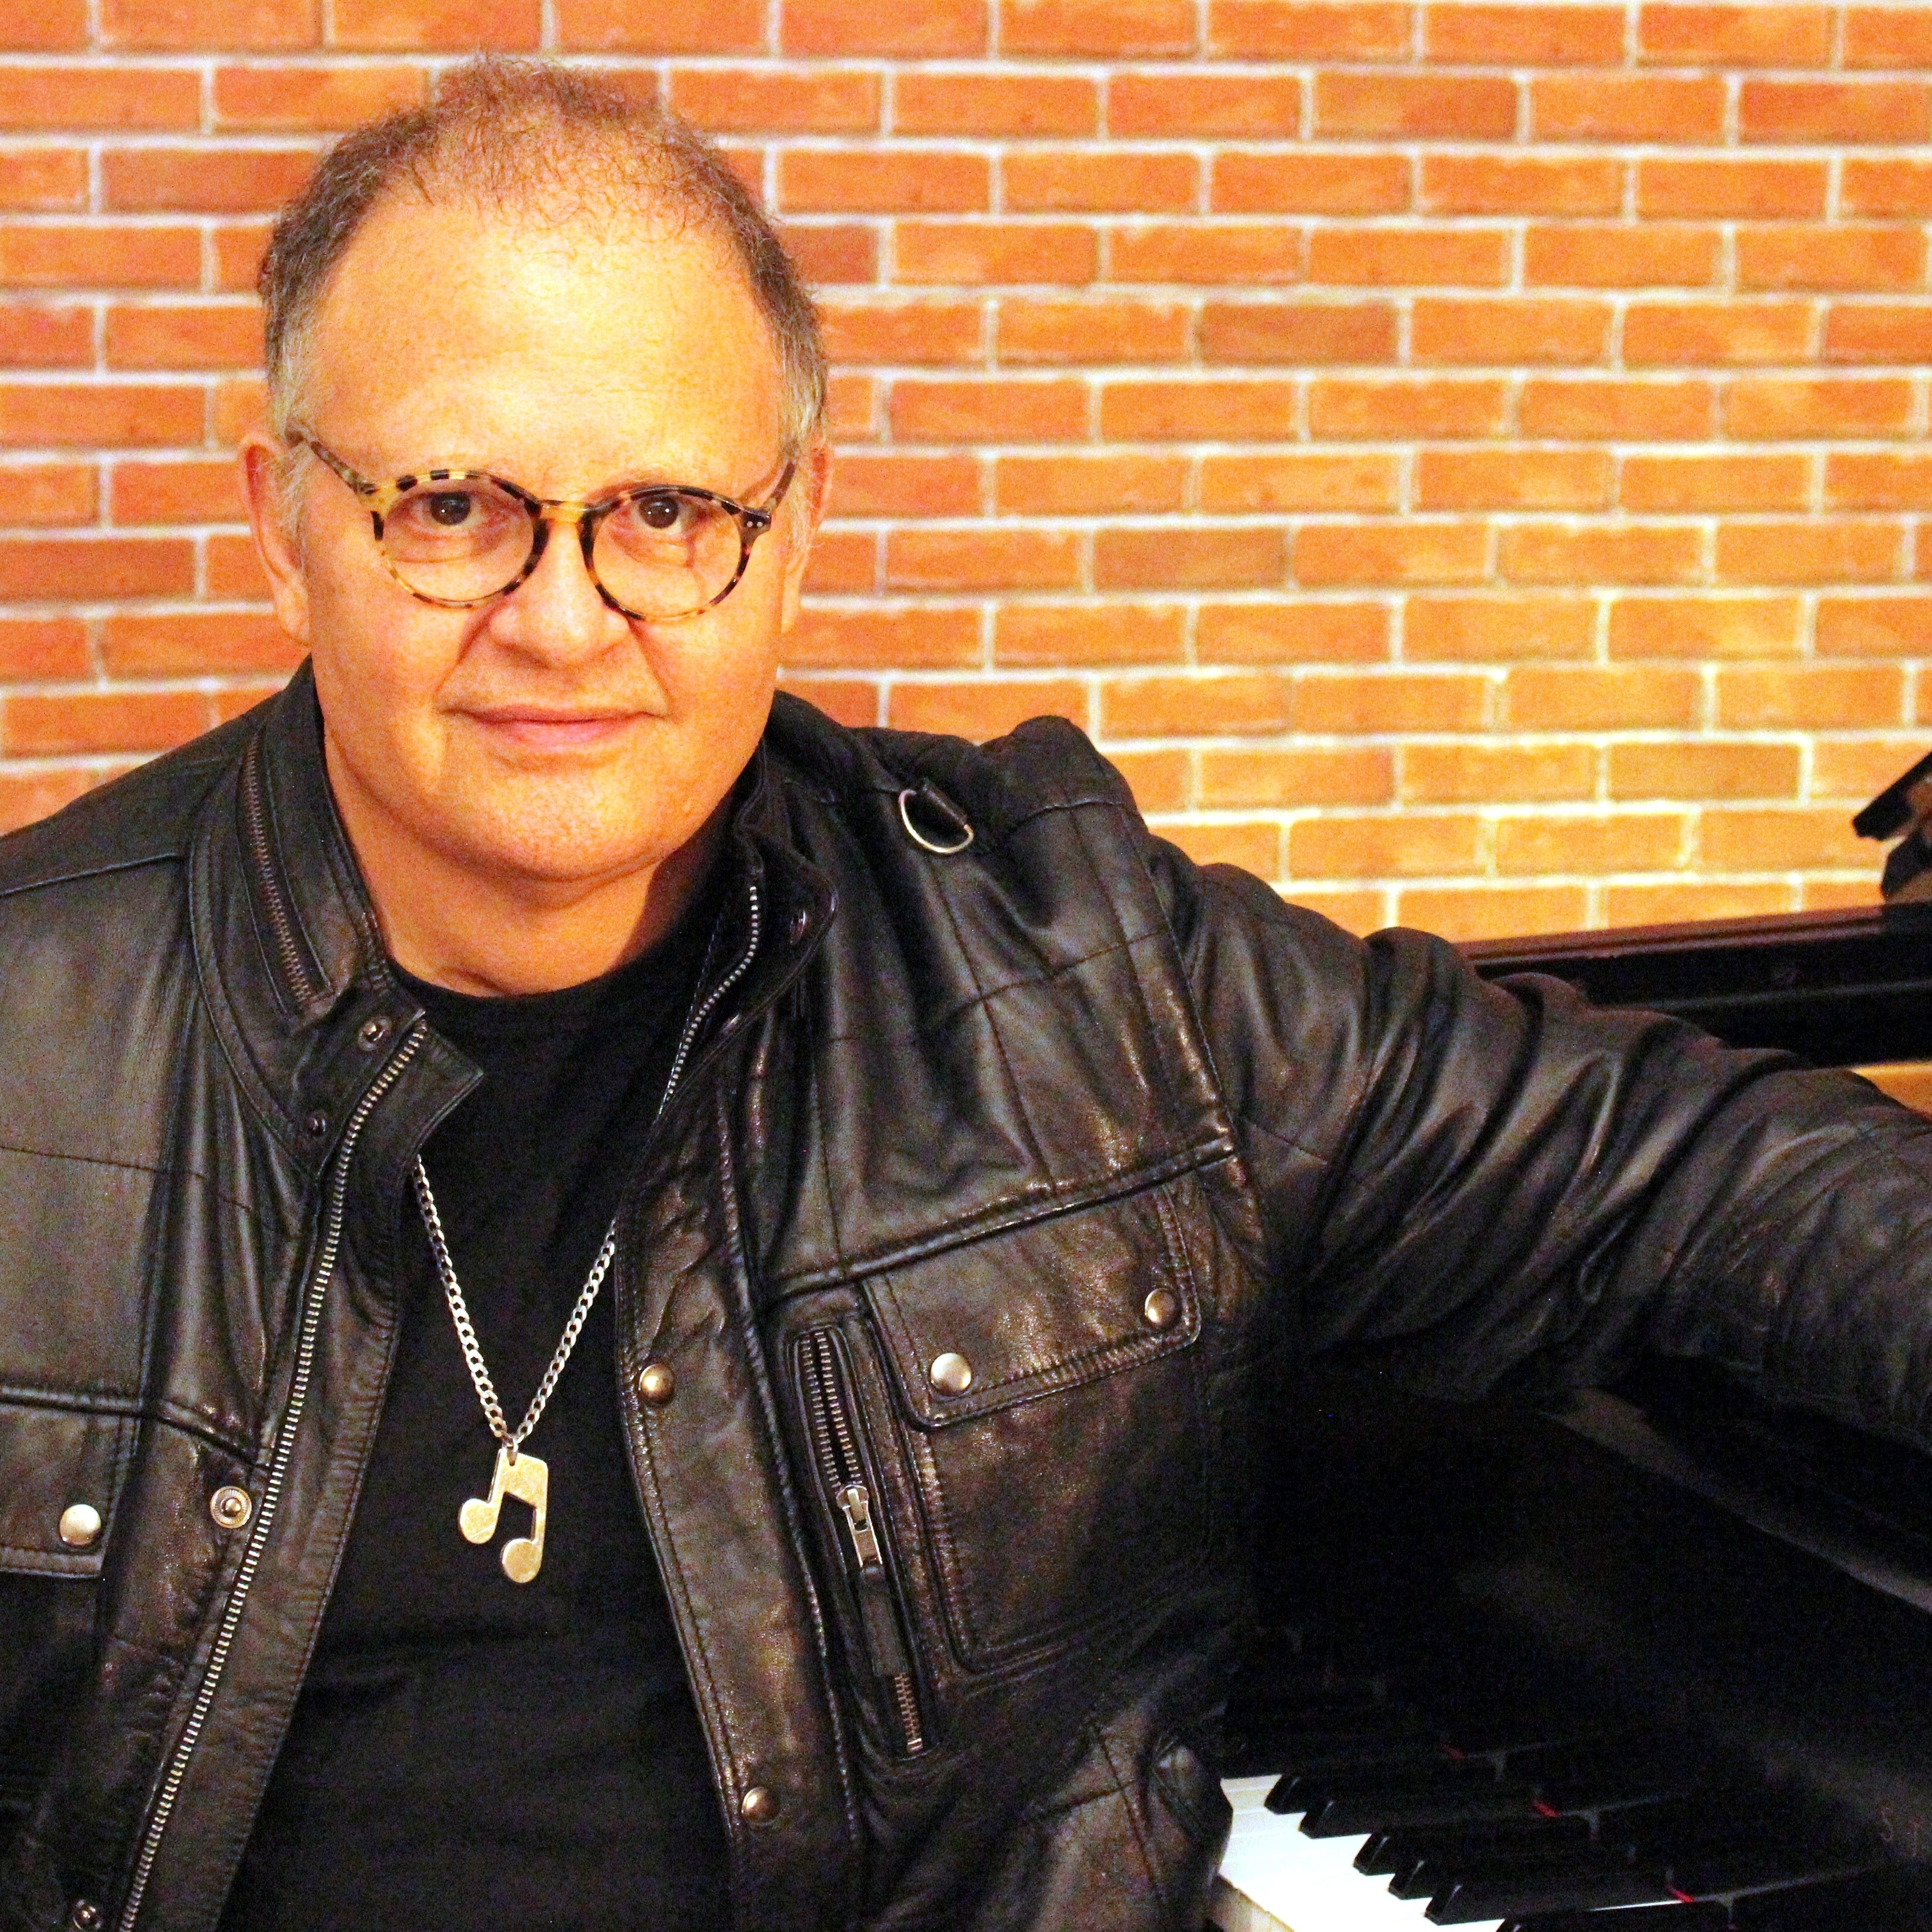 Guilherme Arantes in Concert